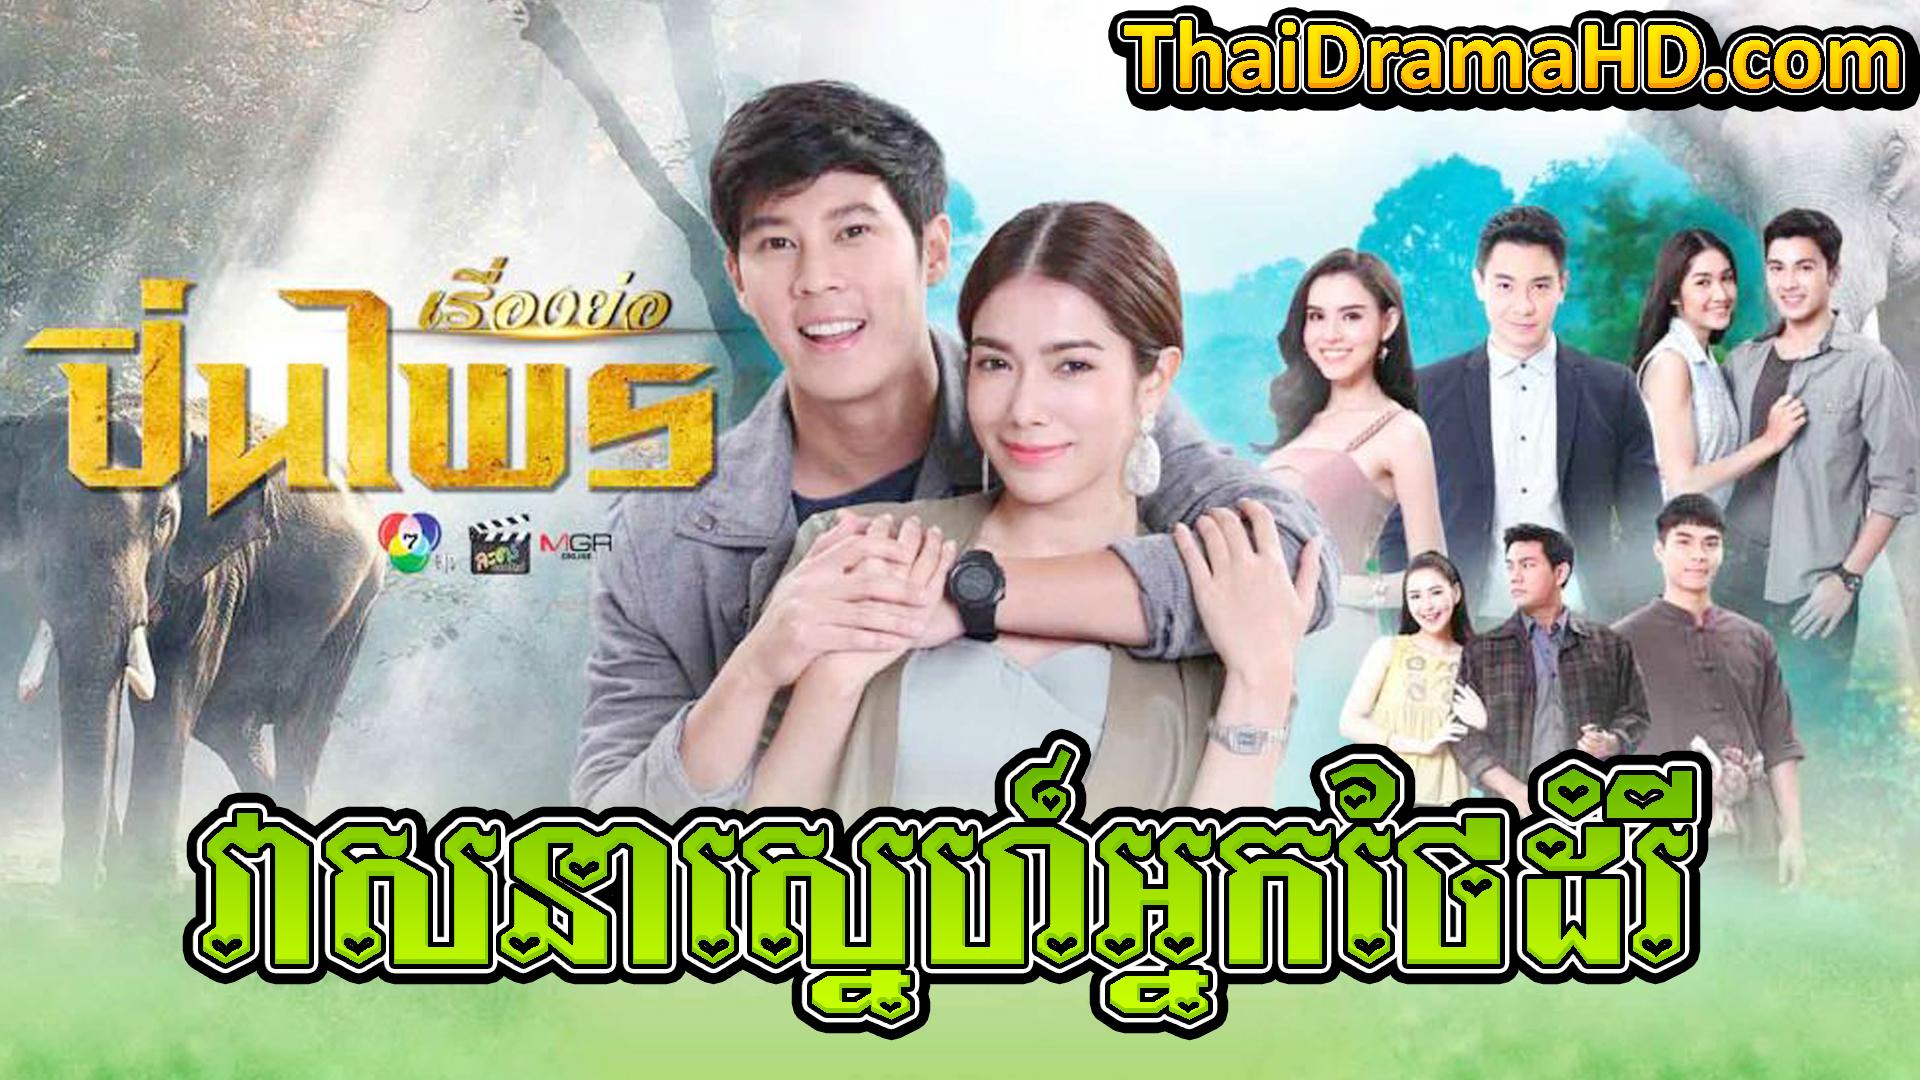 Veasna Sne Nak Thae Damrey | Thai Drama | Khmer Movie | Phumikhmer | movie-khmer | video4khmer | khmotions | kolabkhmer | khmer drama | ksdrama | cookingtips | roscheat | khmertimeskh | khmerkomsan | phumi7 | merlkon | film2us | movie2kh | sweetdrama | khmercitylove | khreplay | tvb cambodia drama | ckh7 | srokthai | phumimedia | phumi8 | khmer avenue | khmer search | Soyo | khmerfans